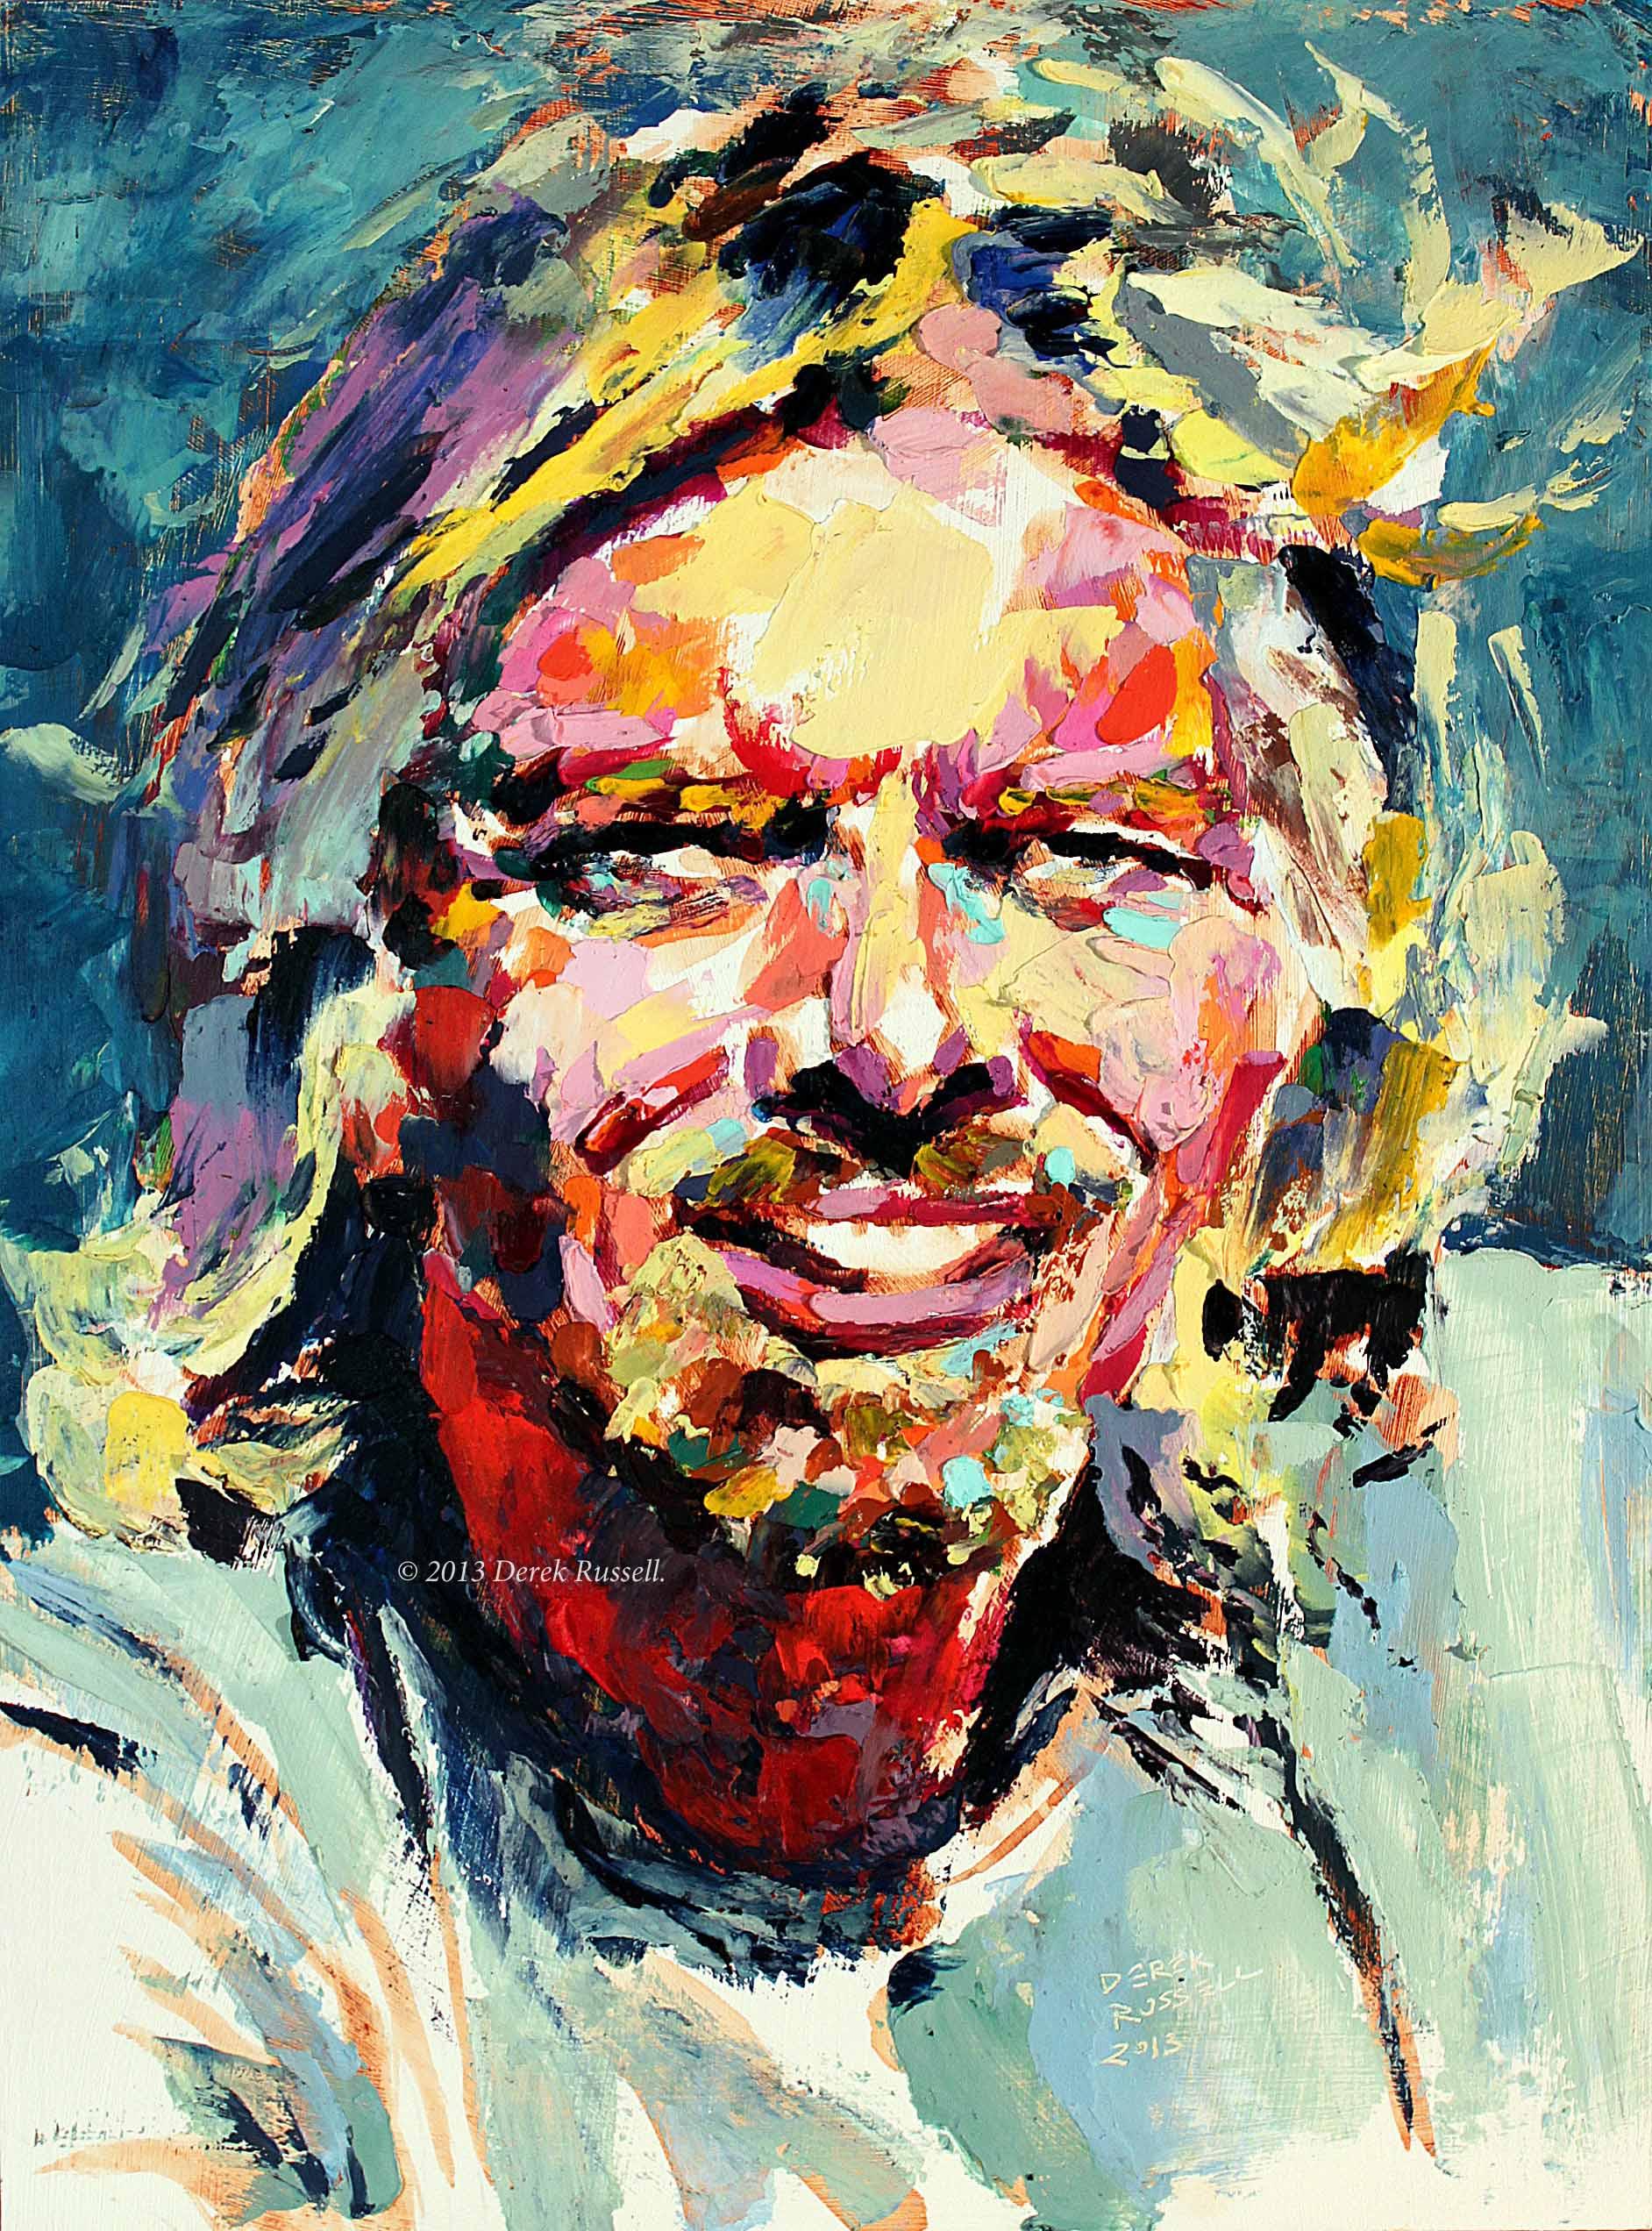 Richard Branson Original Oil Painting by Artist Derek Russell